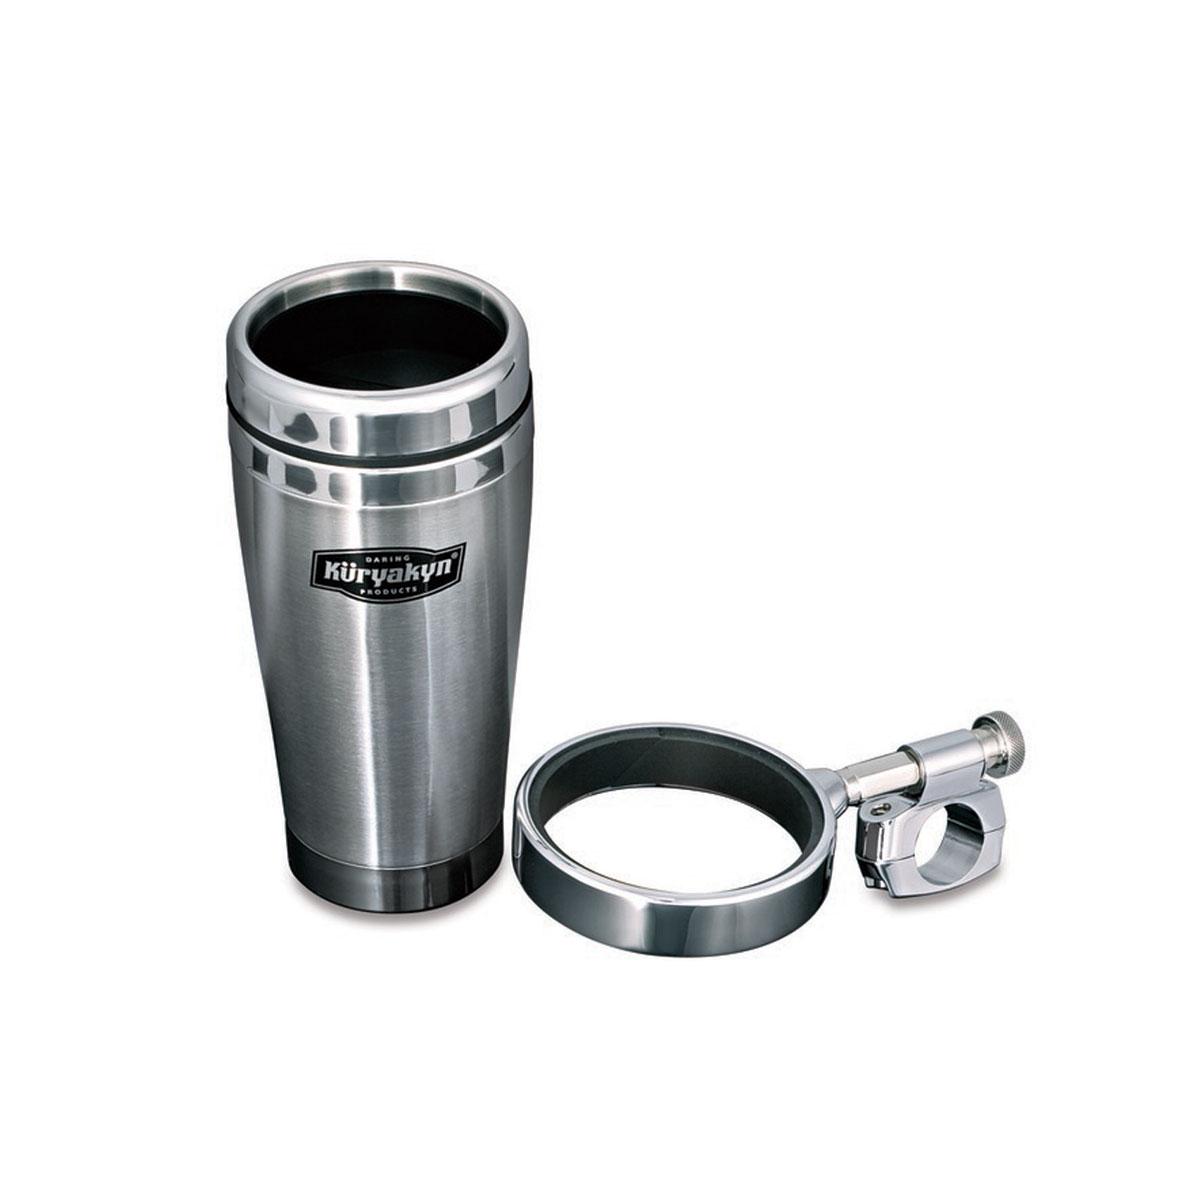 Kuryakyn Universal Drink Holder With Stainless Steel Mug